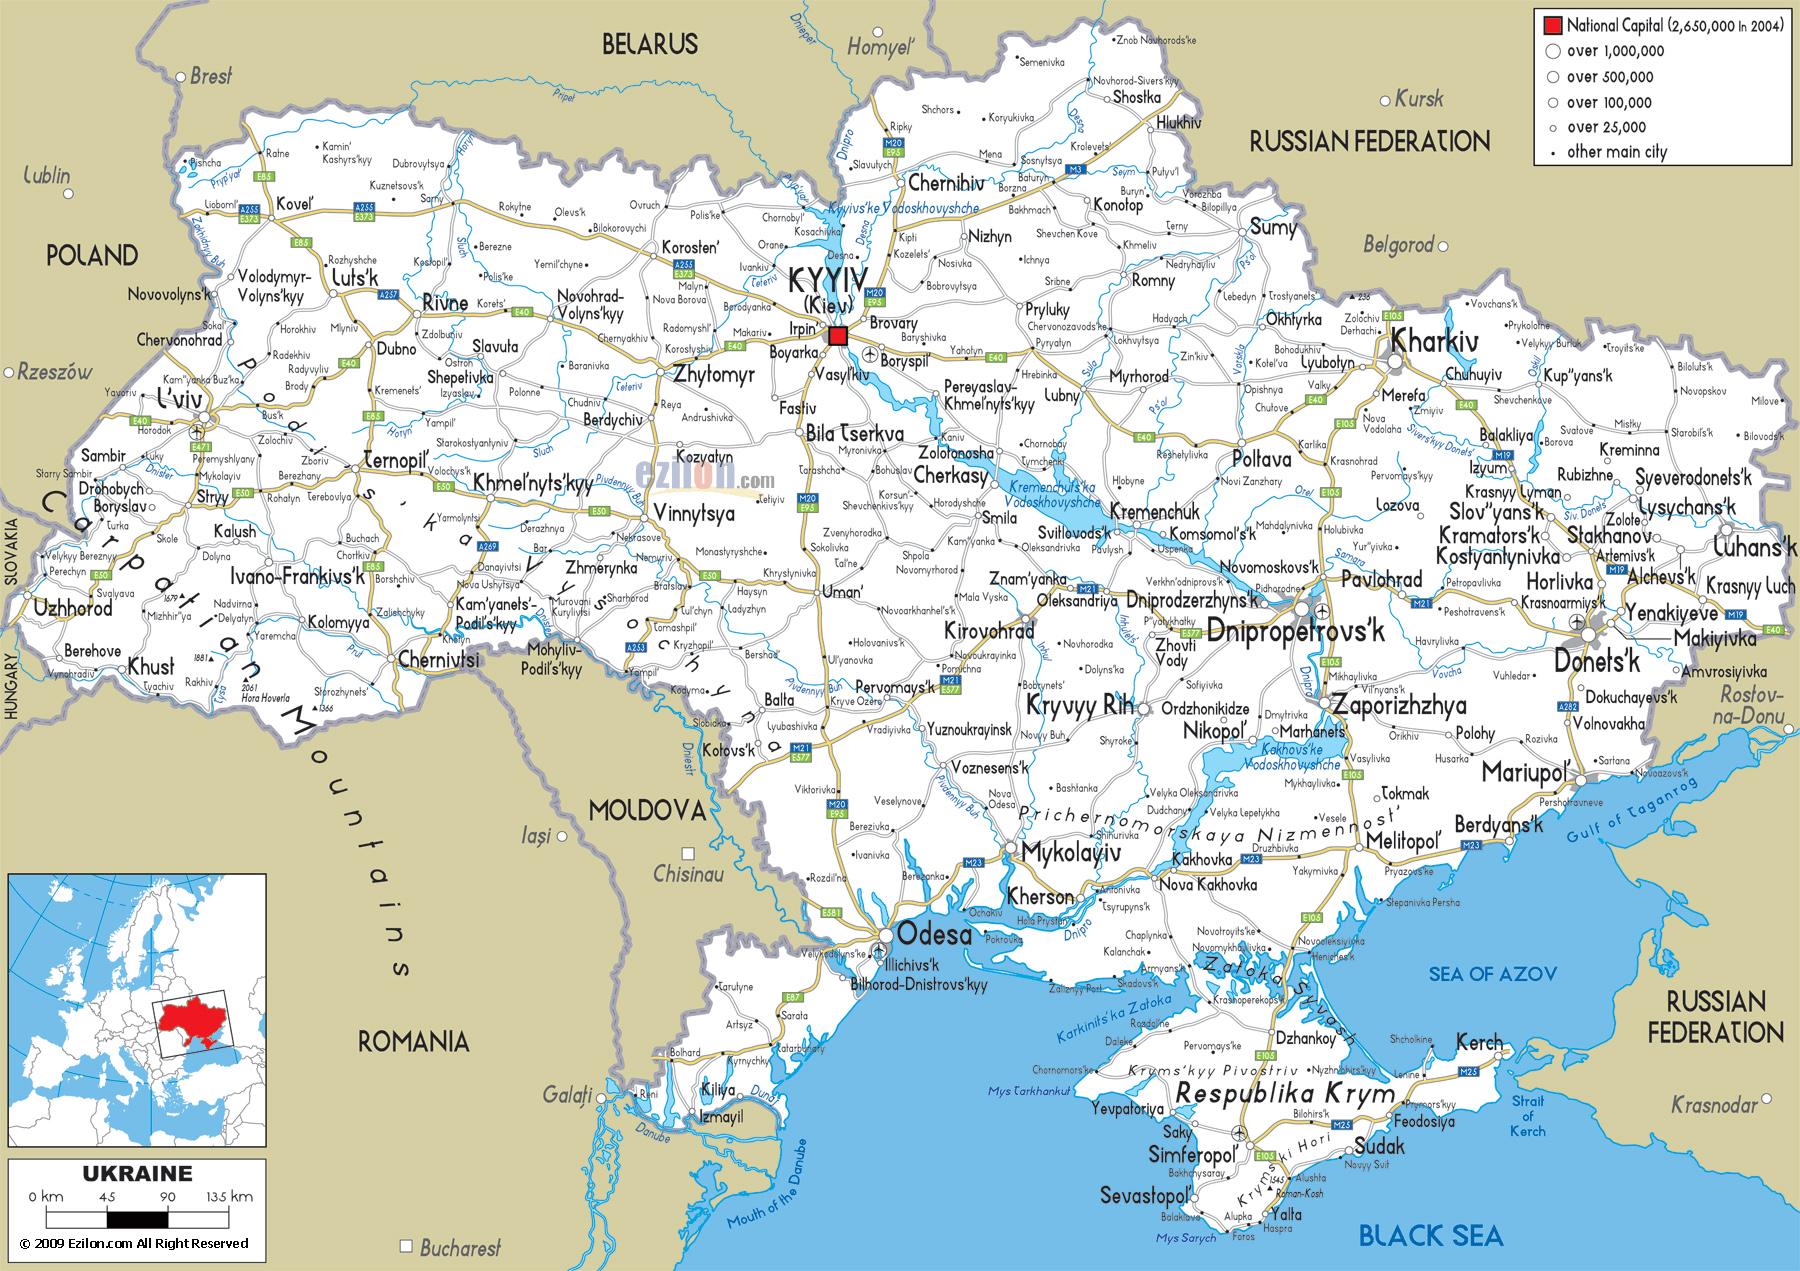 Ukraine Map - Europe - Mapcarta